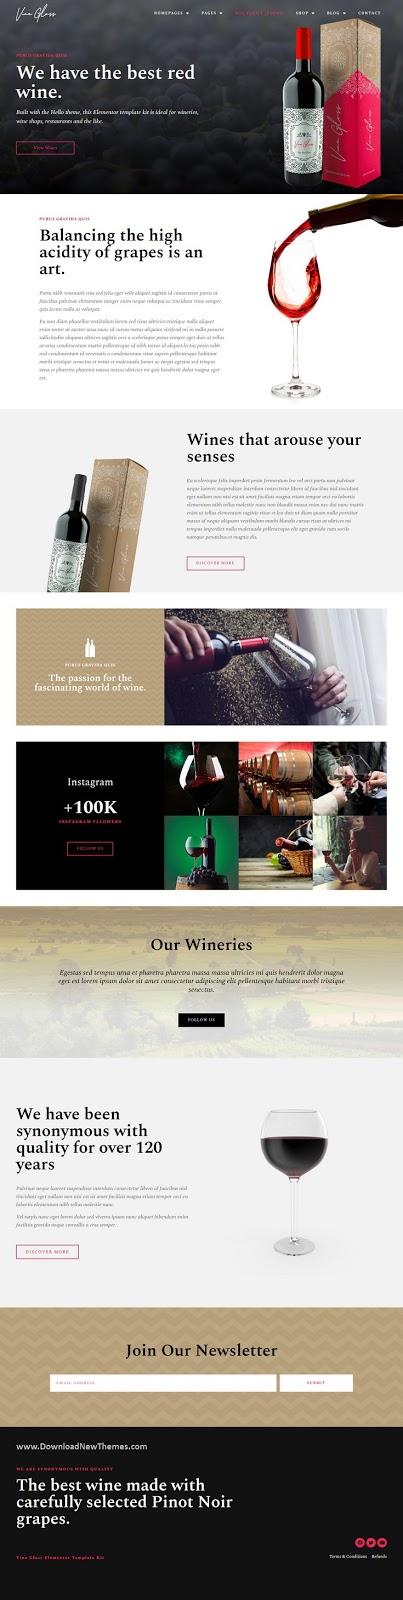 Wine Shop & Vineyard Template Kit